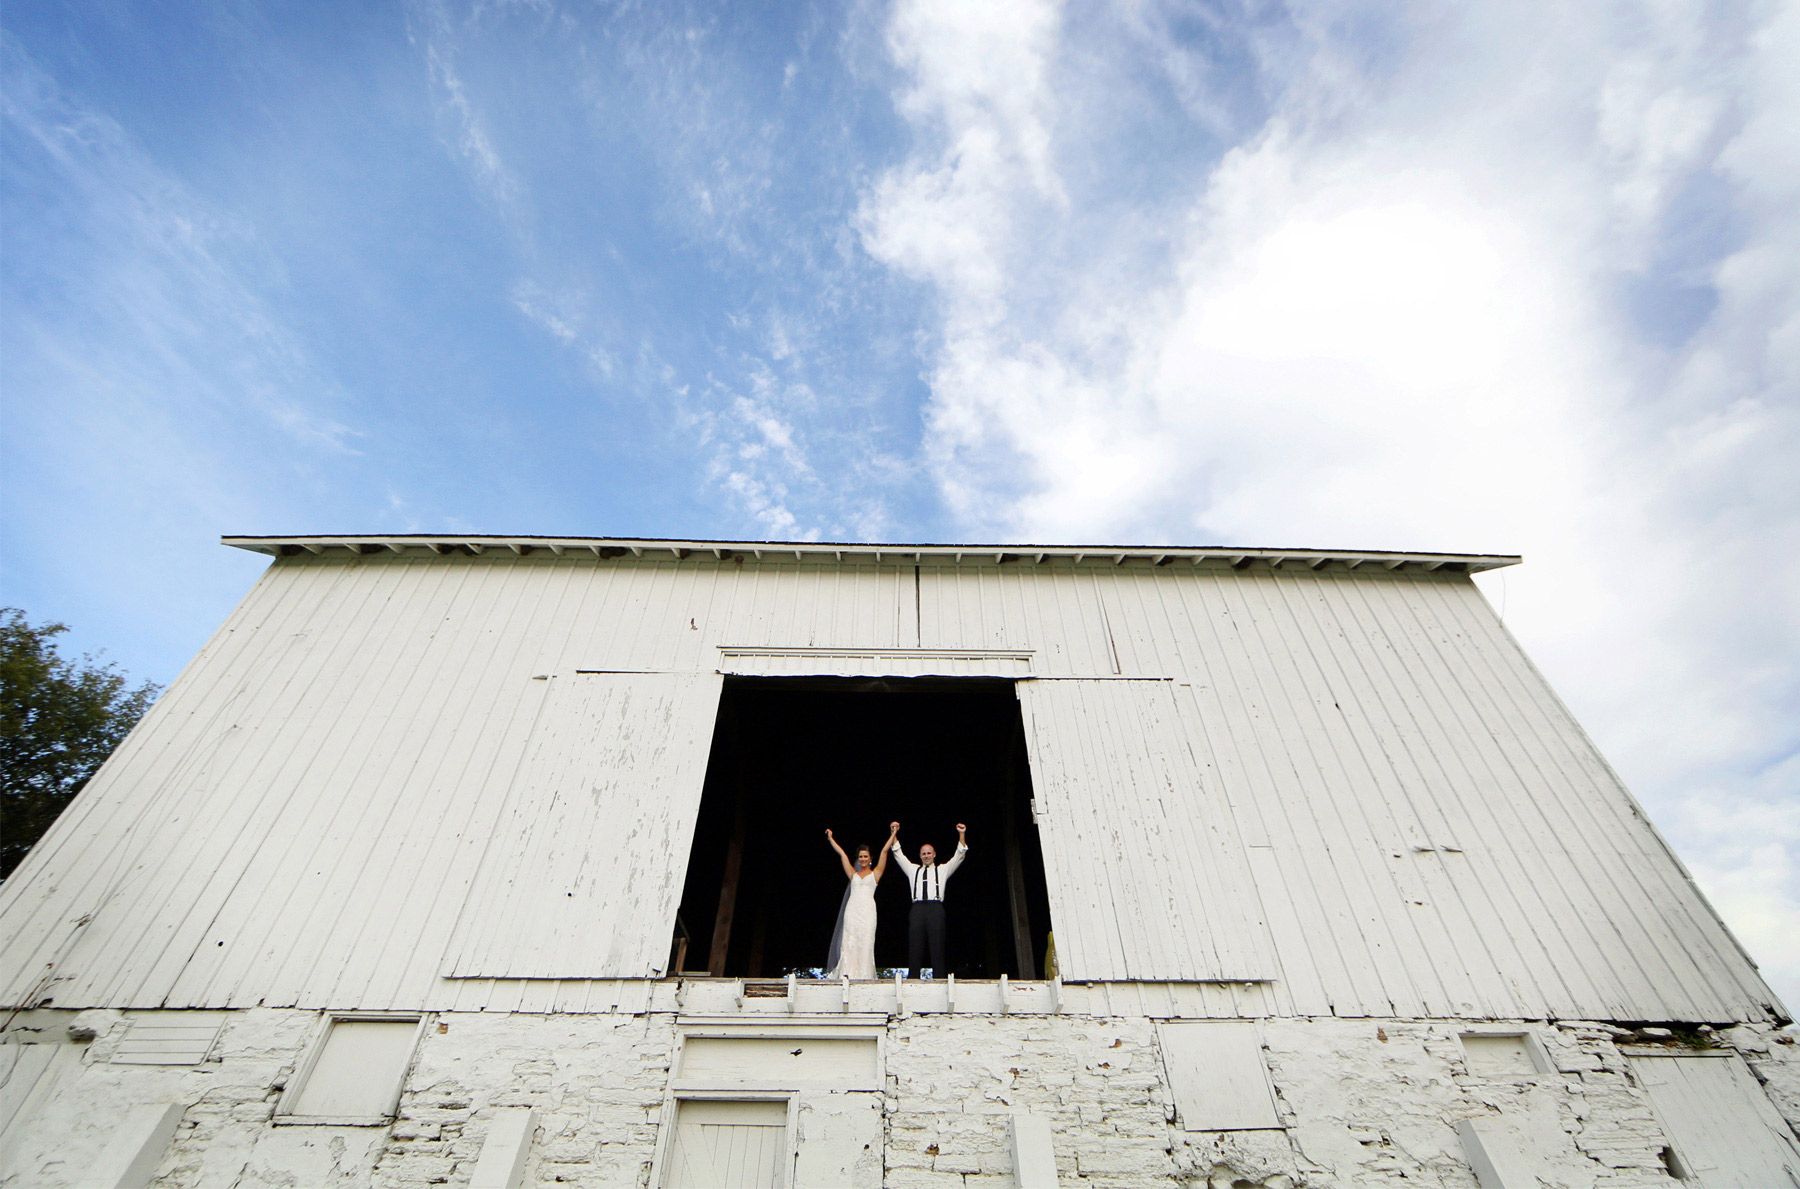 15-Stillwater-Minnesota-Wedding-Photography-by-Vick-Photography-Barn-Rustic-Tara-&-Ryan.jpg